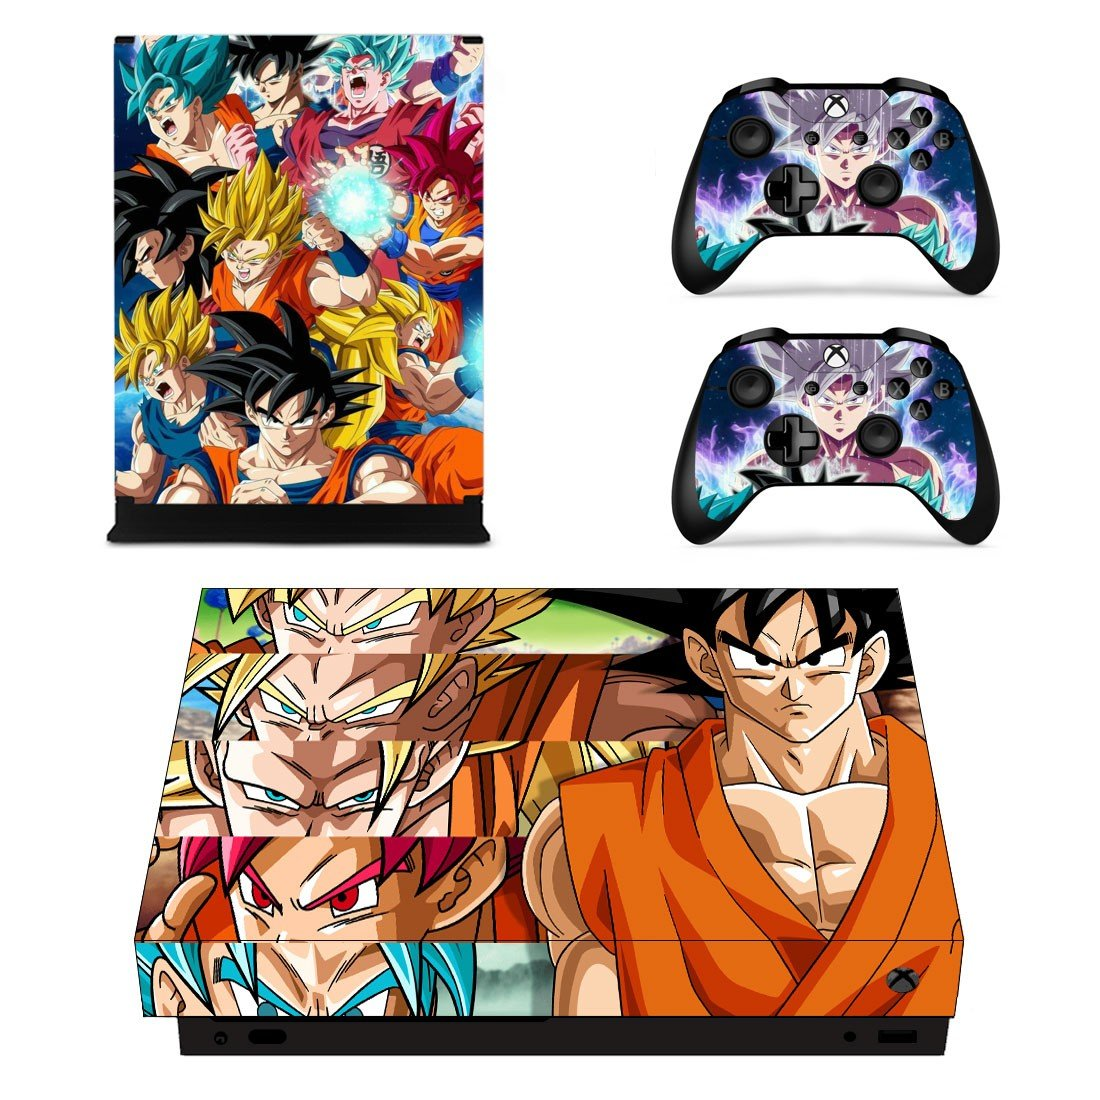 Dragon Ball Xbox one X skin